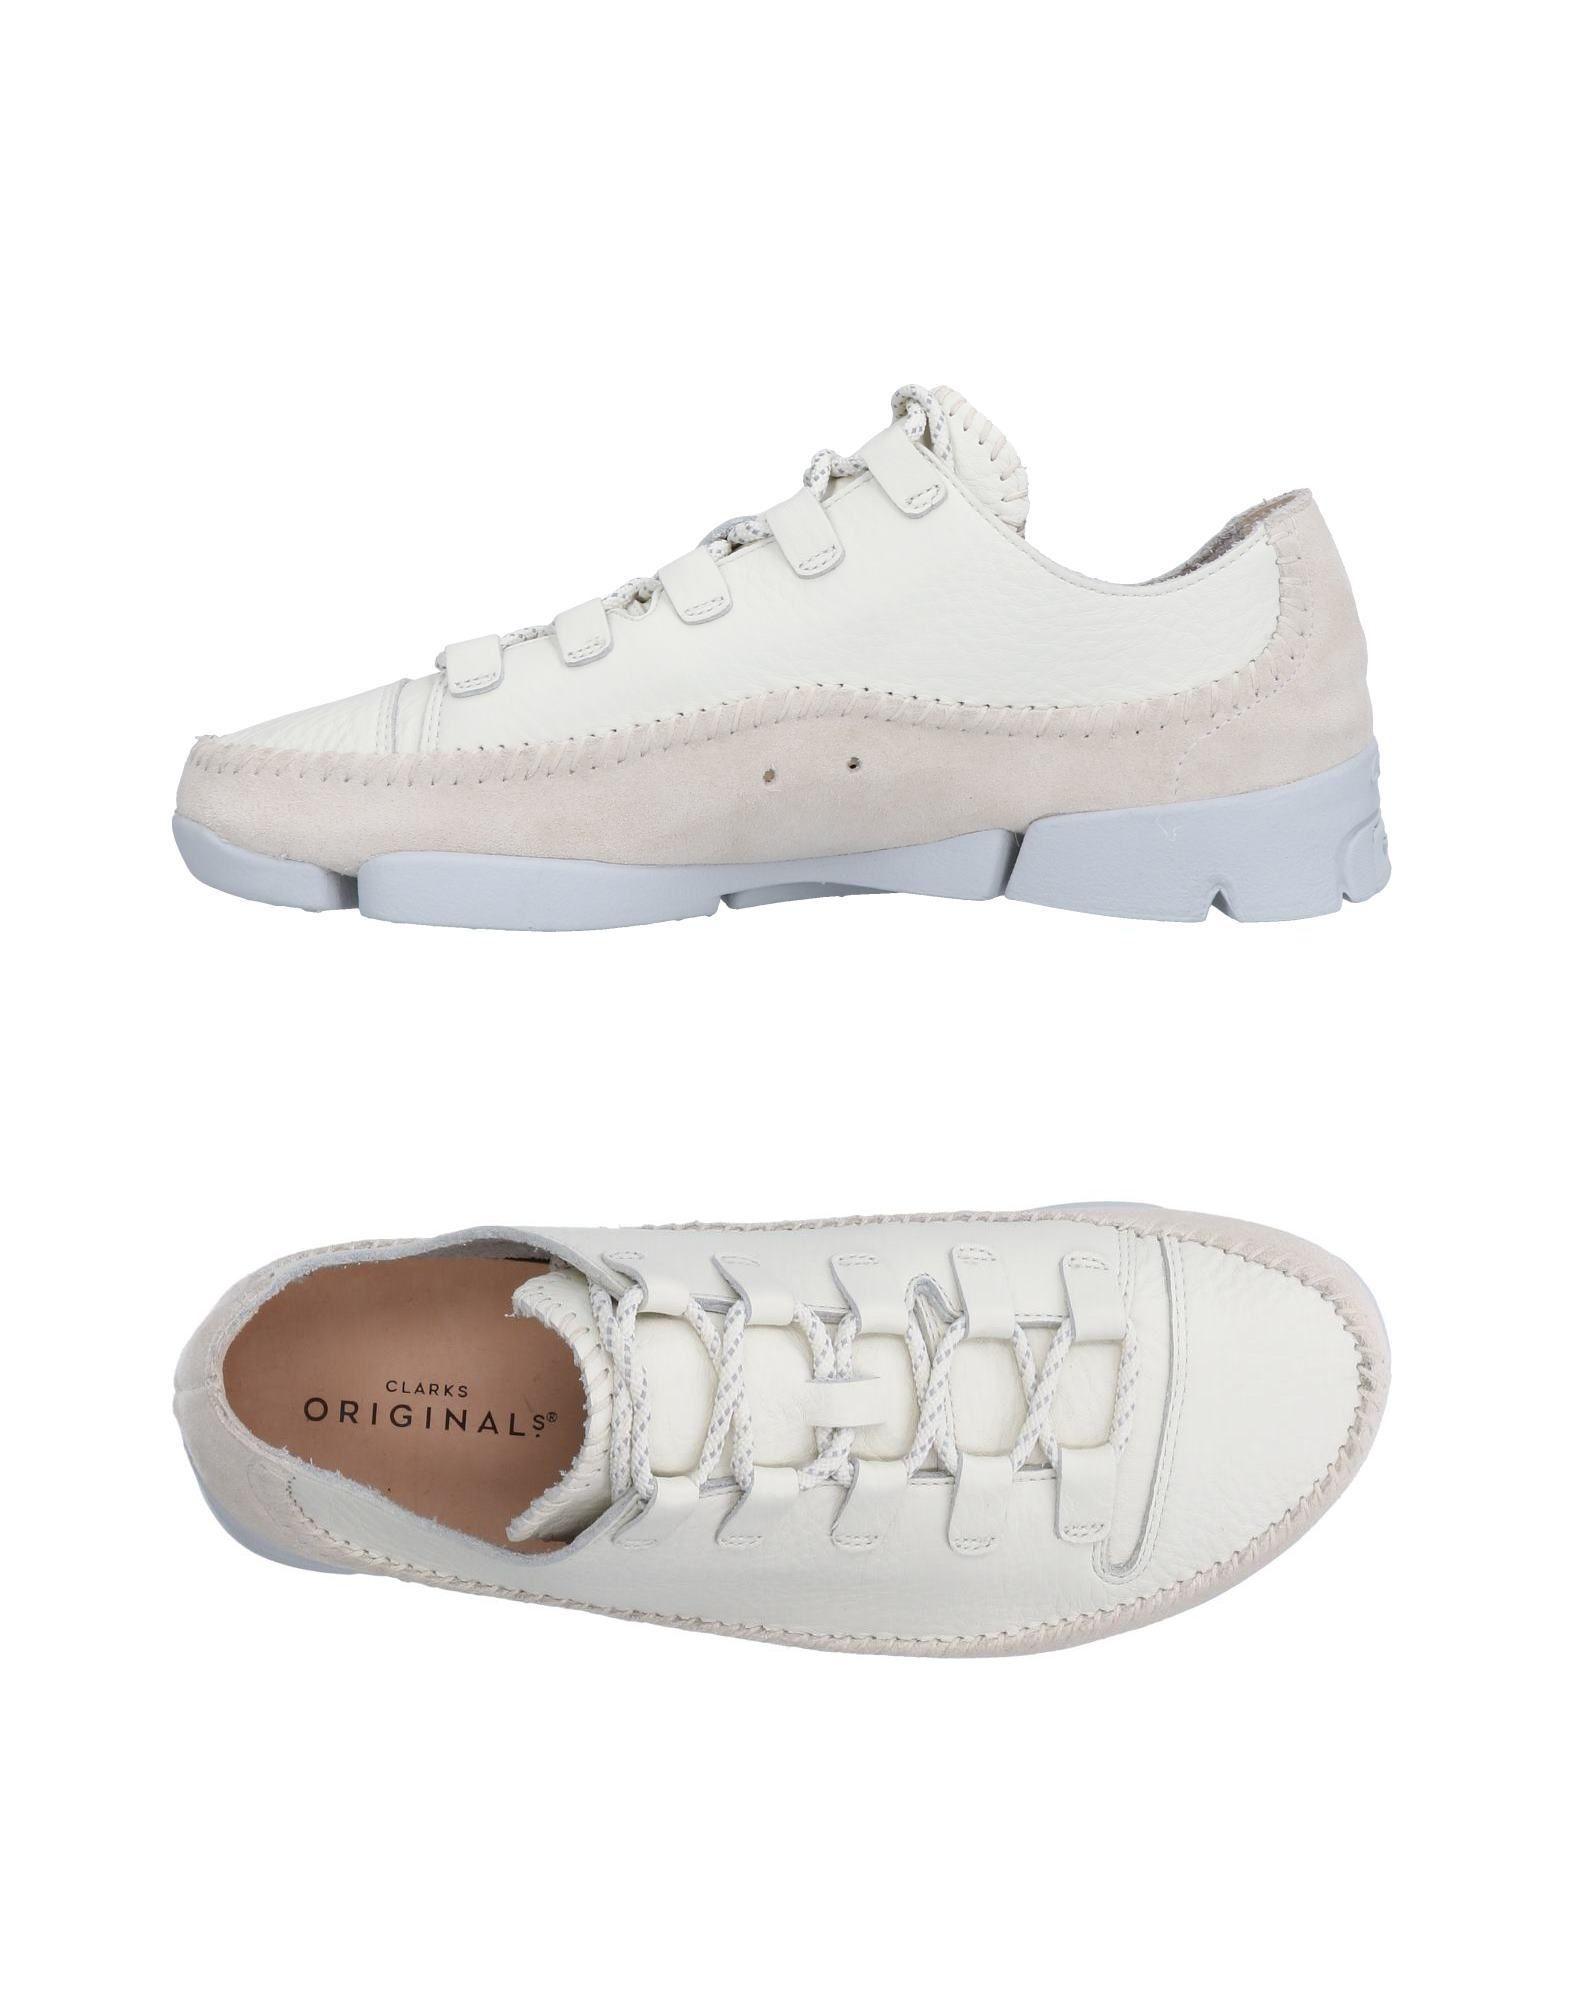 Sneakers Clarks Originals Uomo - 11521262HG